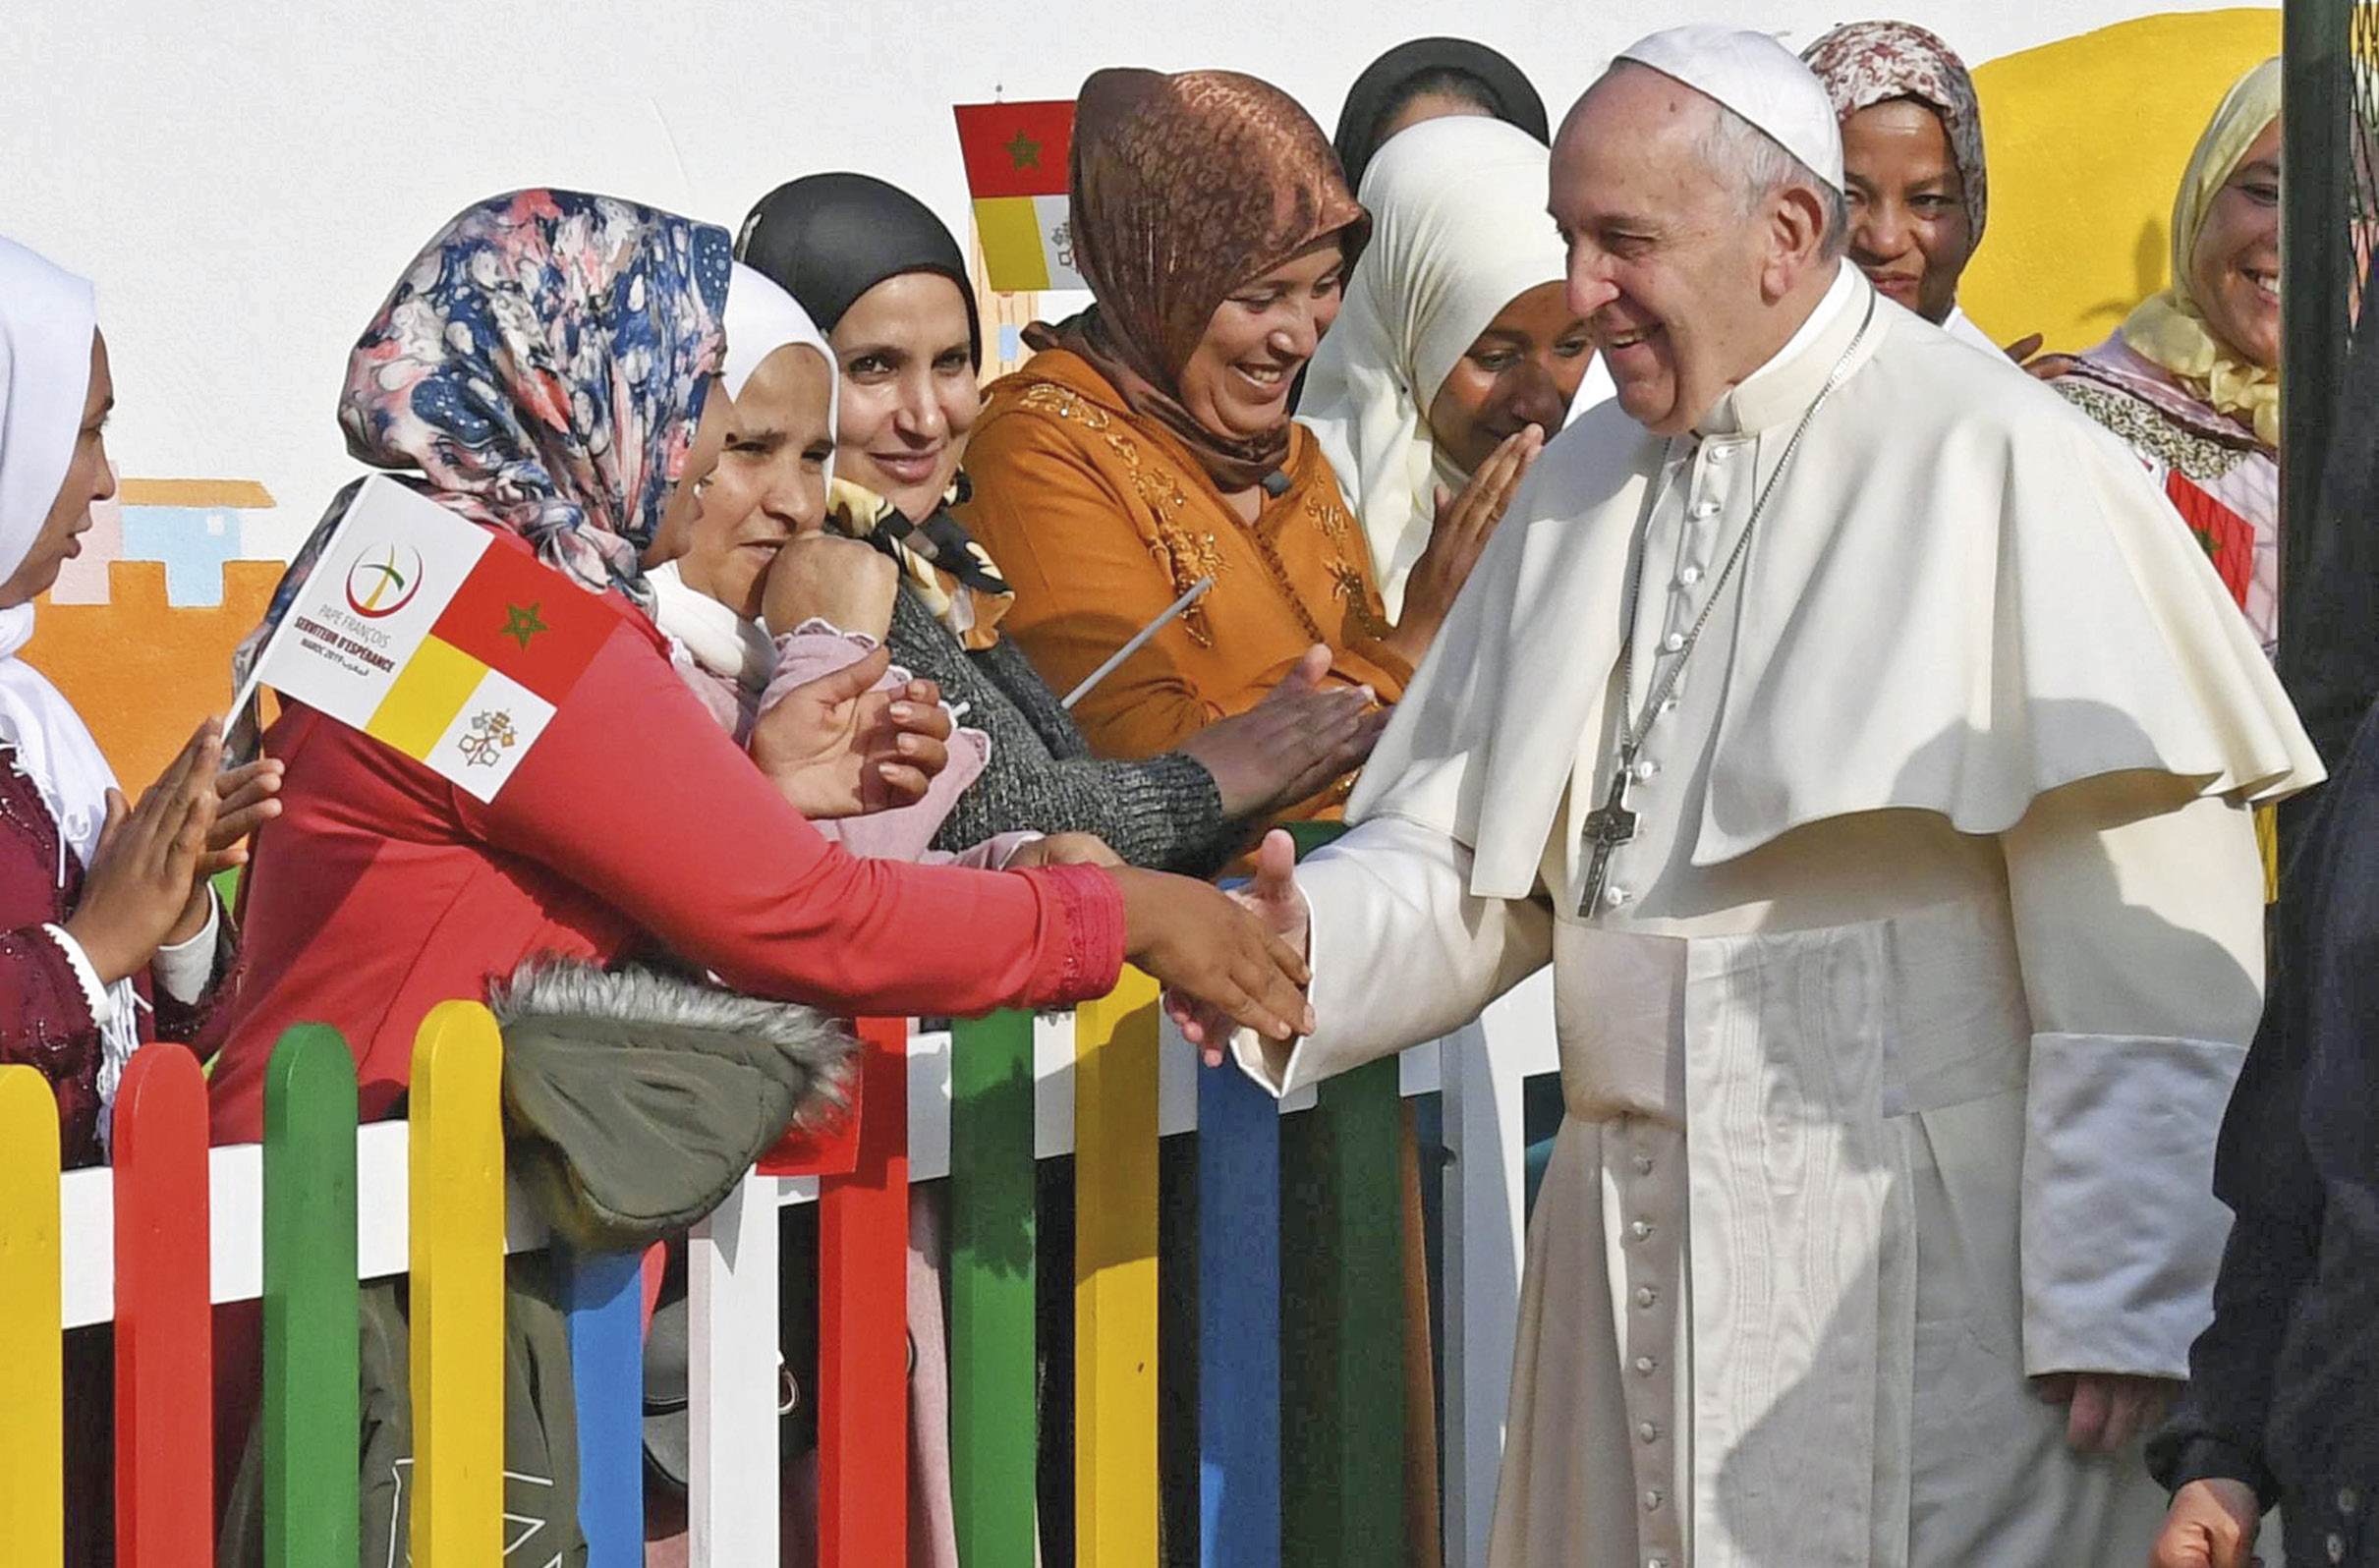 Papa Francisco na visita apostólica a Marrocos, 31 de março de 2019. Foto EPA/Ciro Fusco.